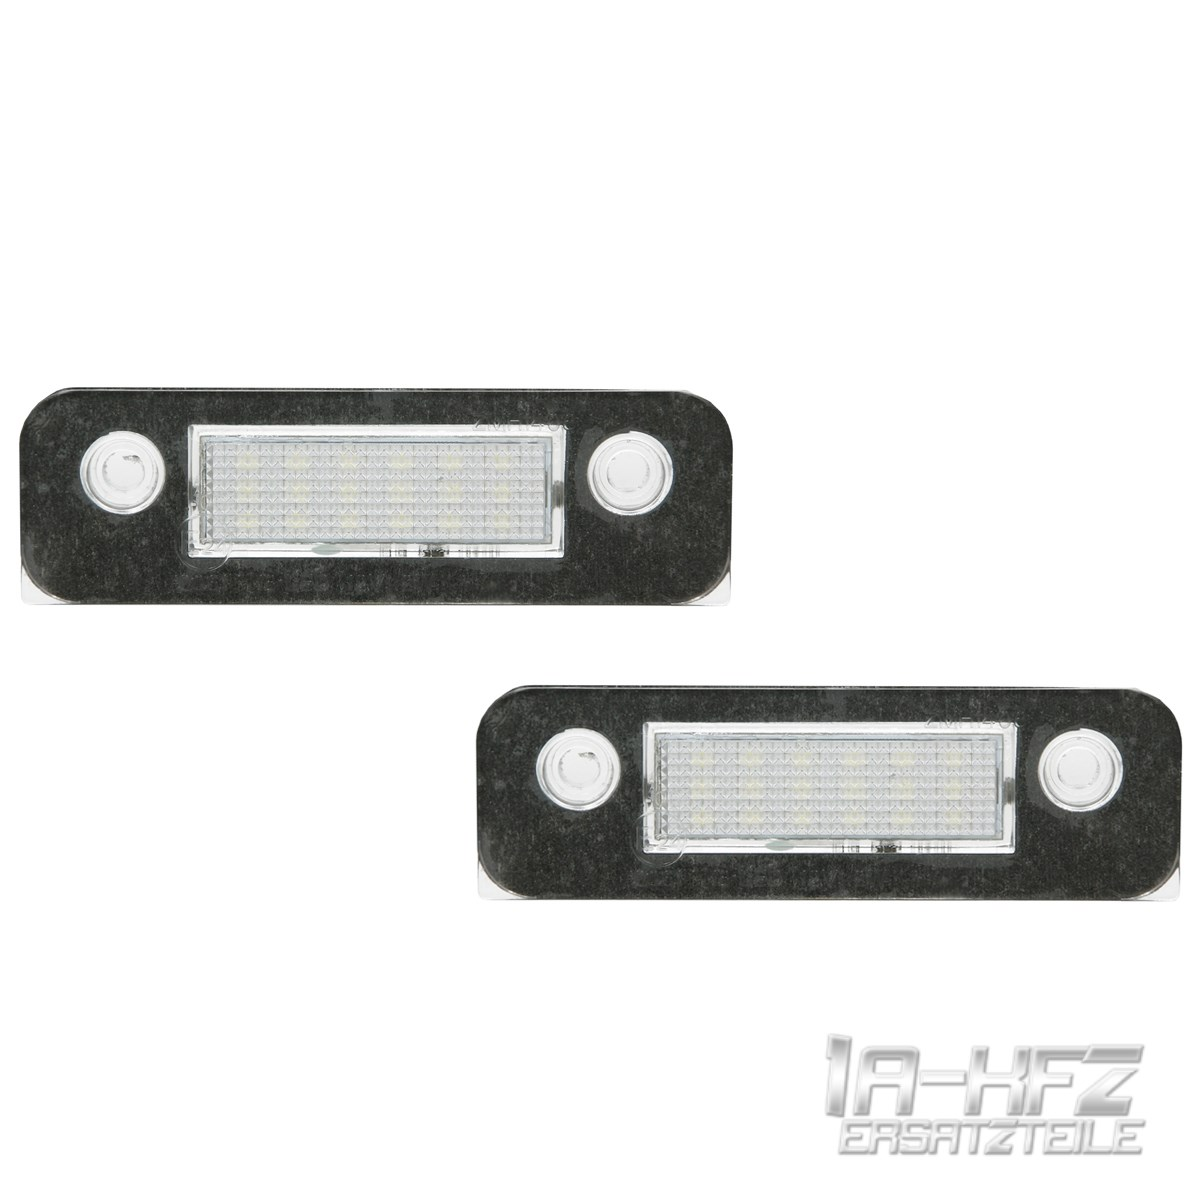 Details zu Set 2x LED license plate light for Ford Mondeo II Mk2 1.6 2.5 Fusion JU Fiesta V